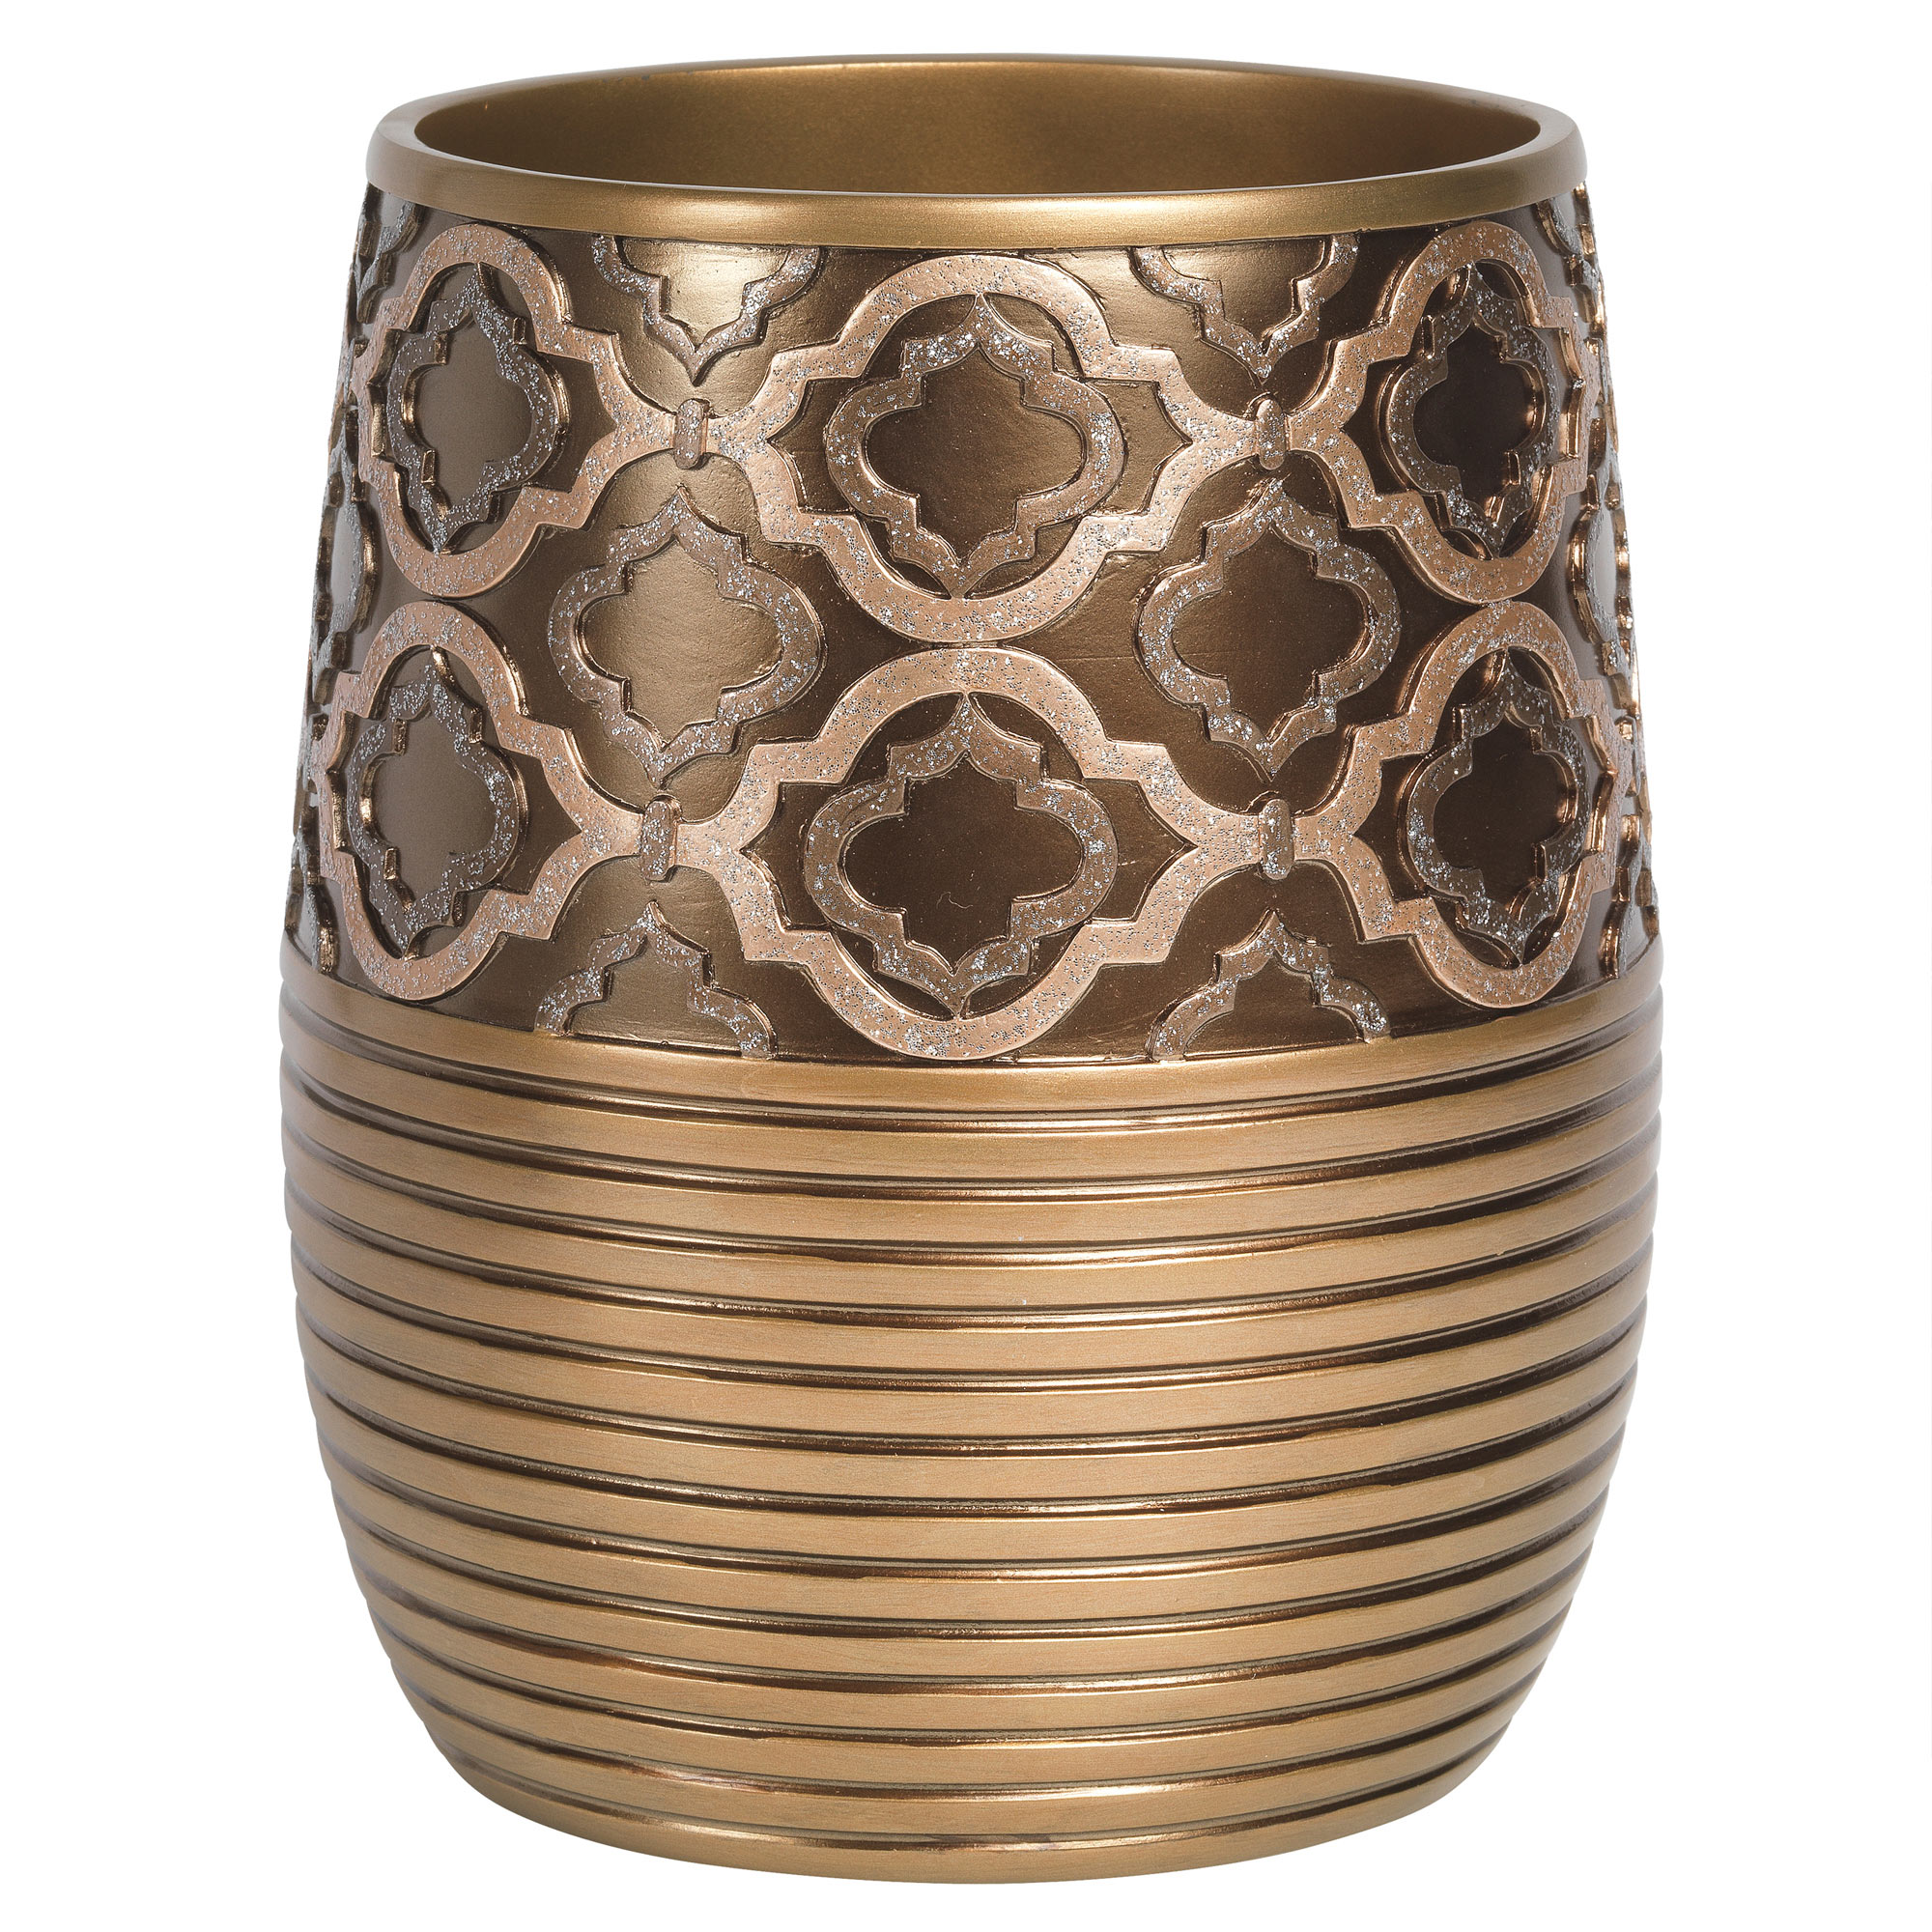 Beige//Gold Popular Bath Seraphina Bathroom Waste Basket